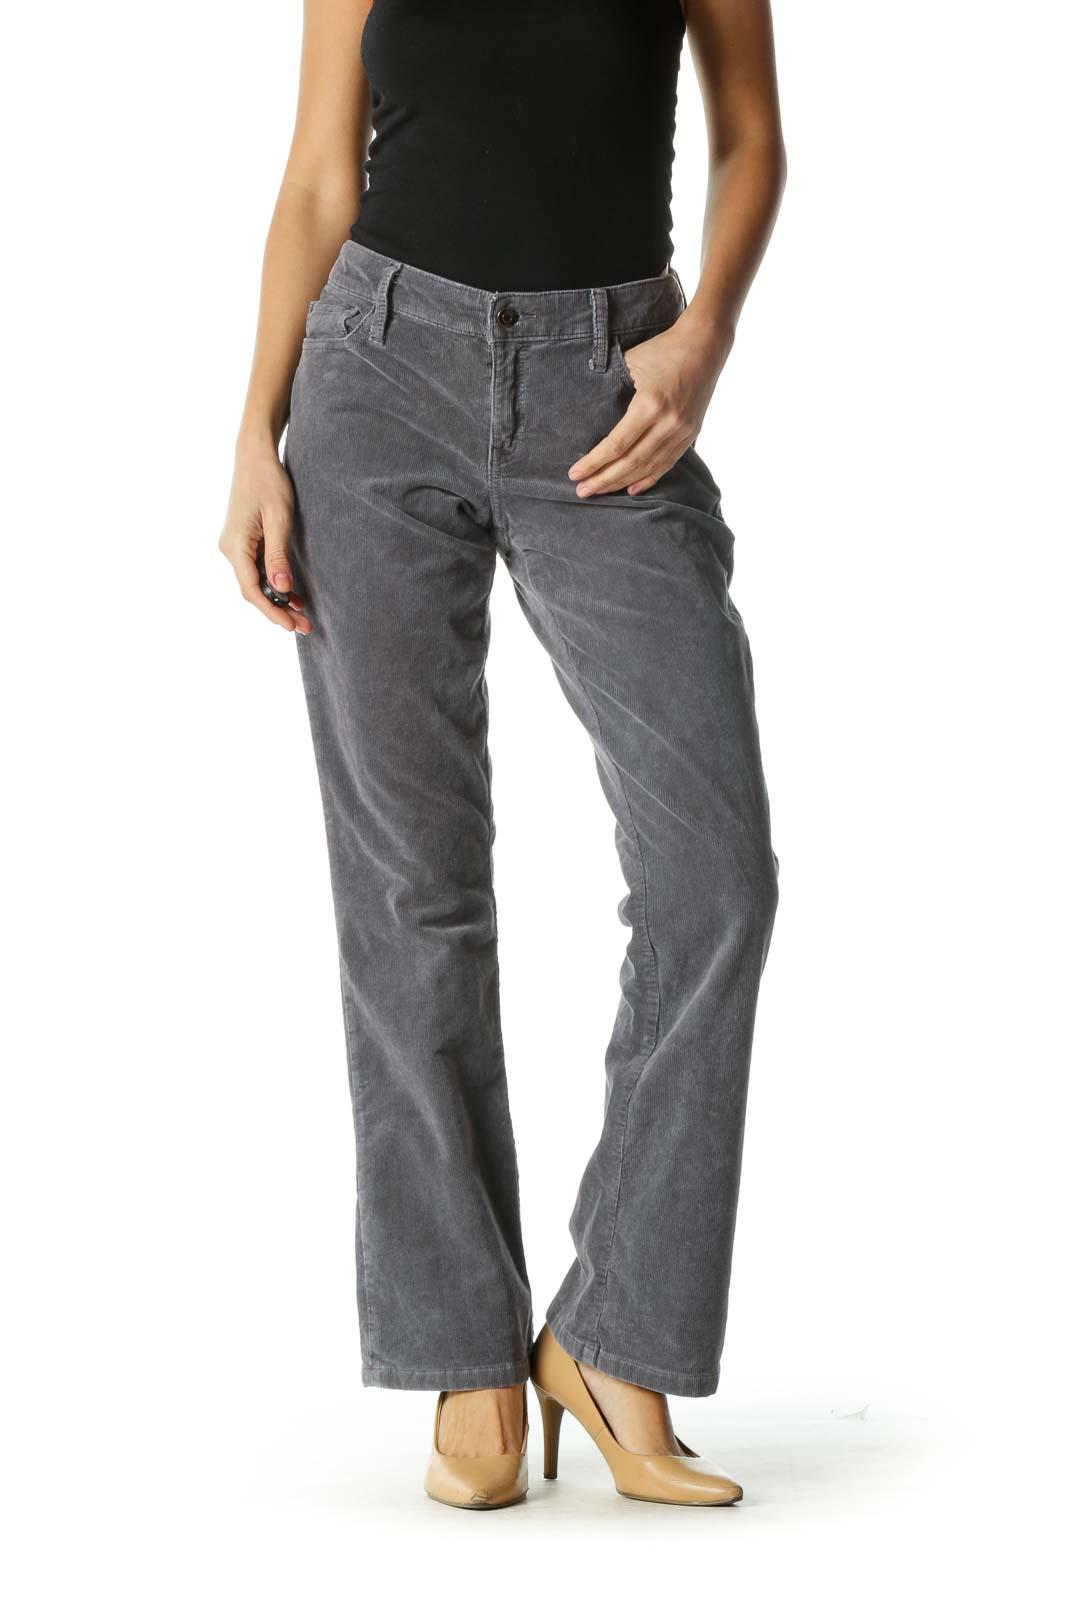 Gray Corduroy Boot Cut Pants Front